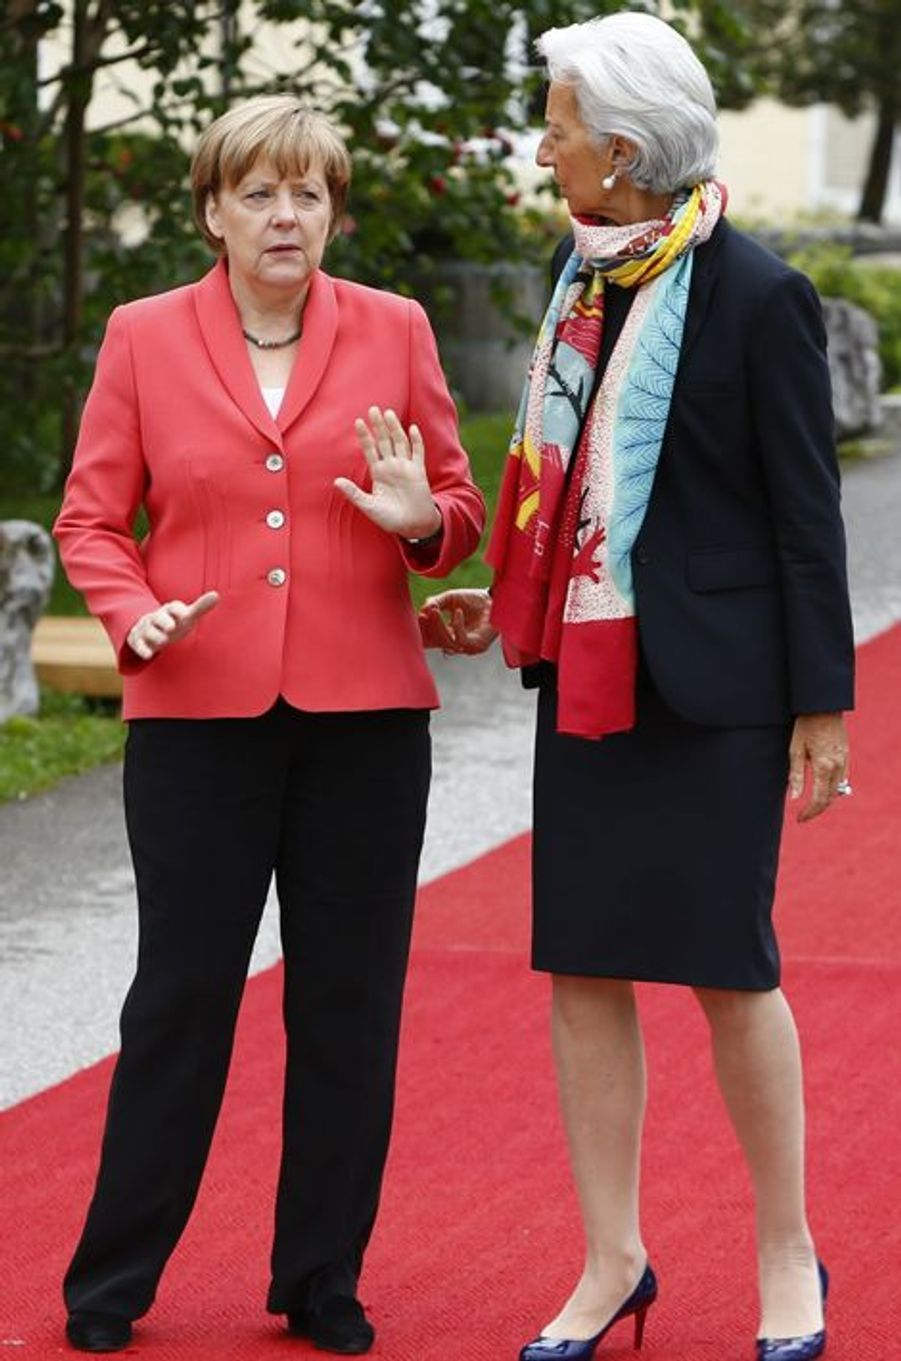 Angela Merkel et Christine Lagarde au sommet du G7 en Bavière